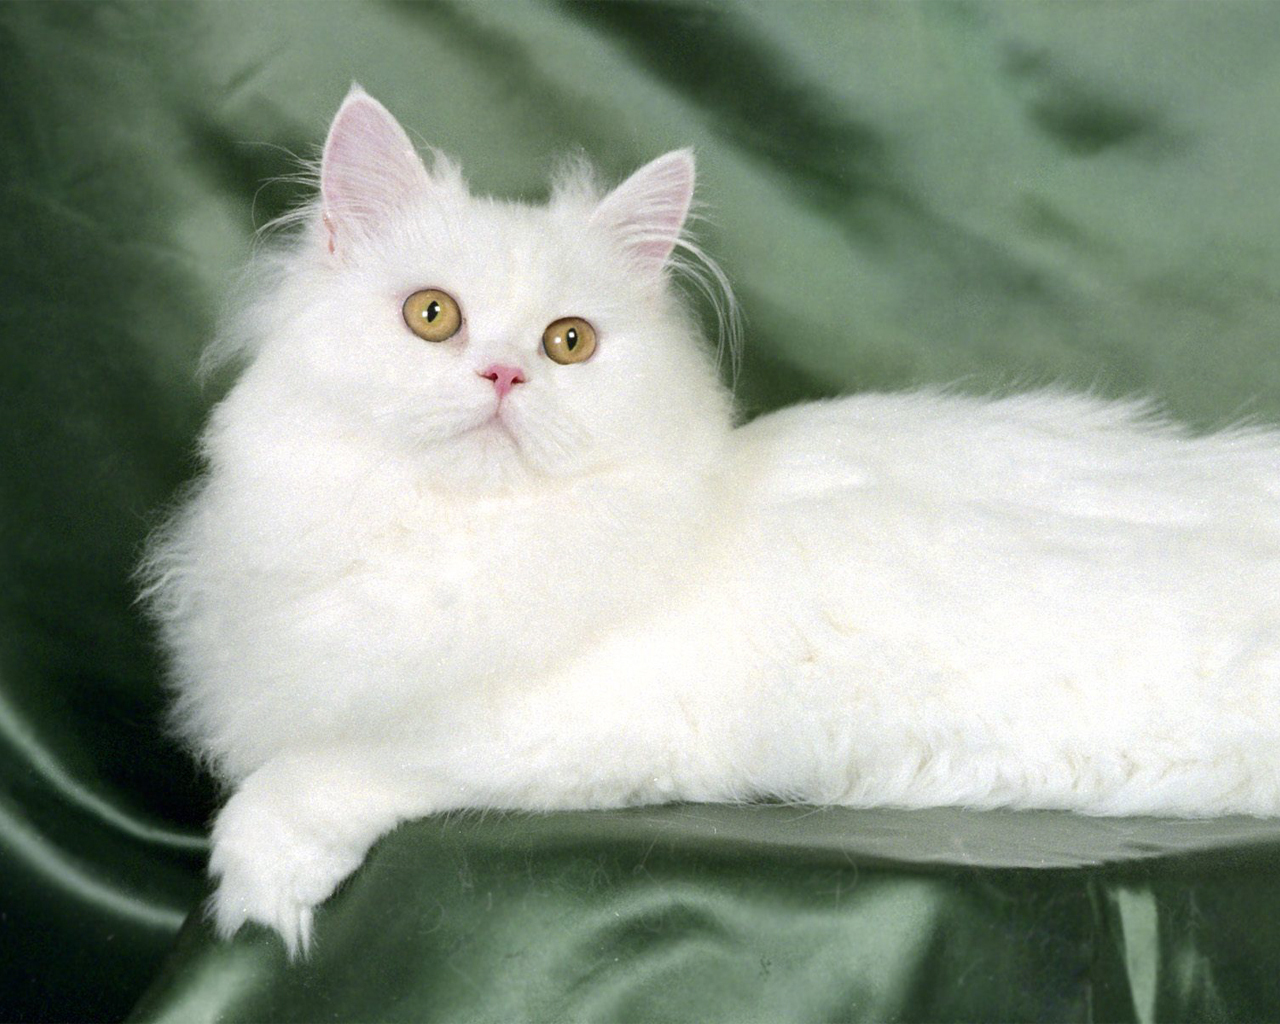 http://3.bp.blogspot.com/-VFgV_yZbAkU/Thq82uIGjBI/AAAAAAAABvQ/Tjo4OUKYlks/s1600/Cats-wallpaper-cats-5194915-1280-1024.jpg